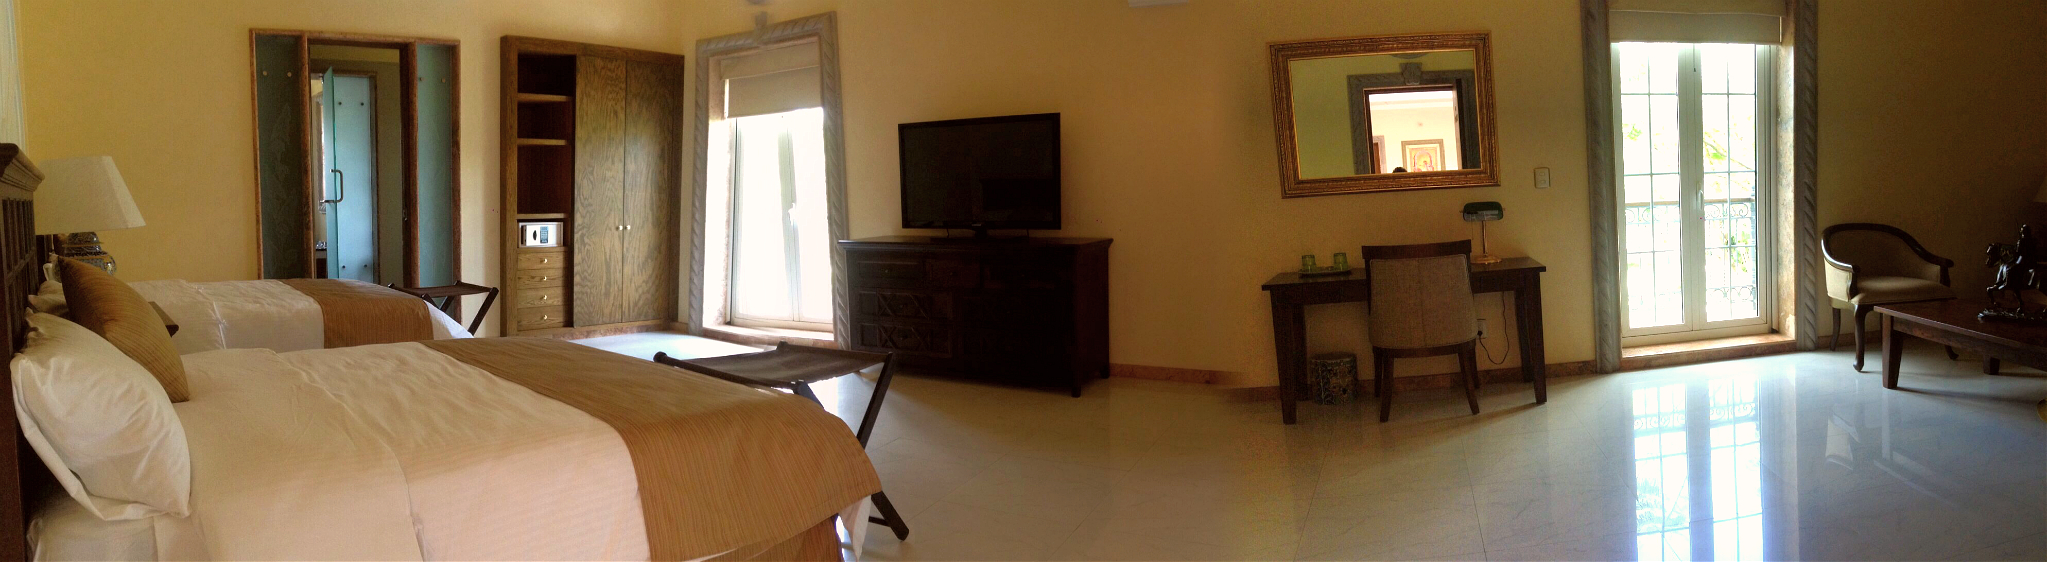 Habitacion villa toscana 3.jpg